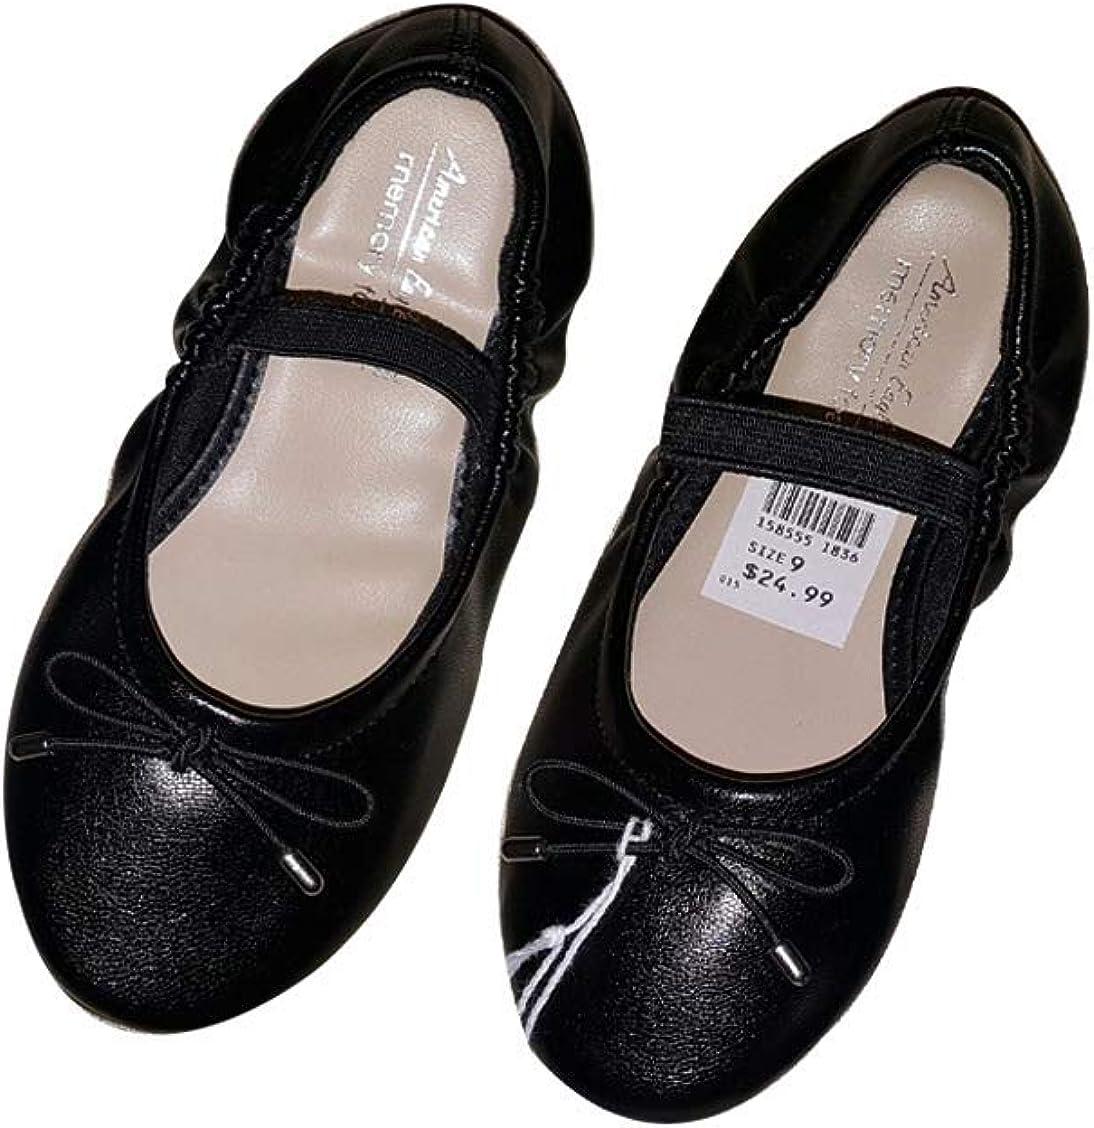 American Eagle Toddler Girl's Ballet Flat Shoes